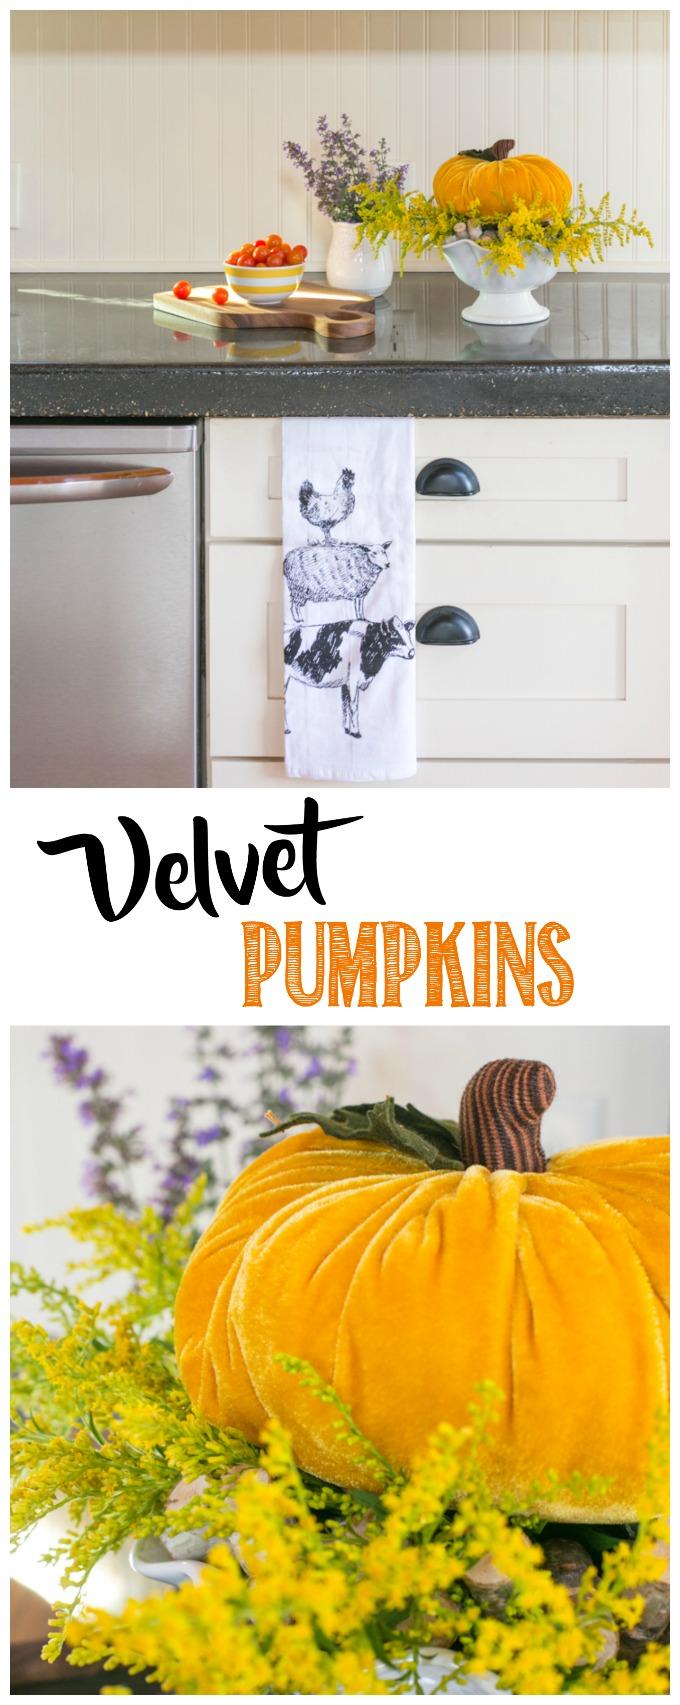 Velvet Pumpkin, Fall Home Decor, Popular Pin